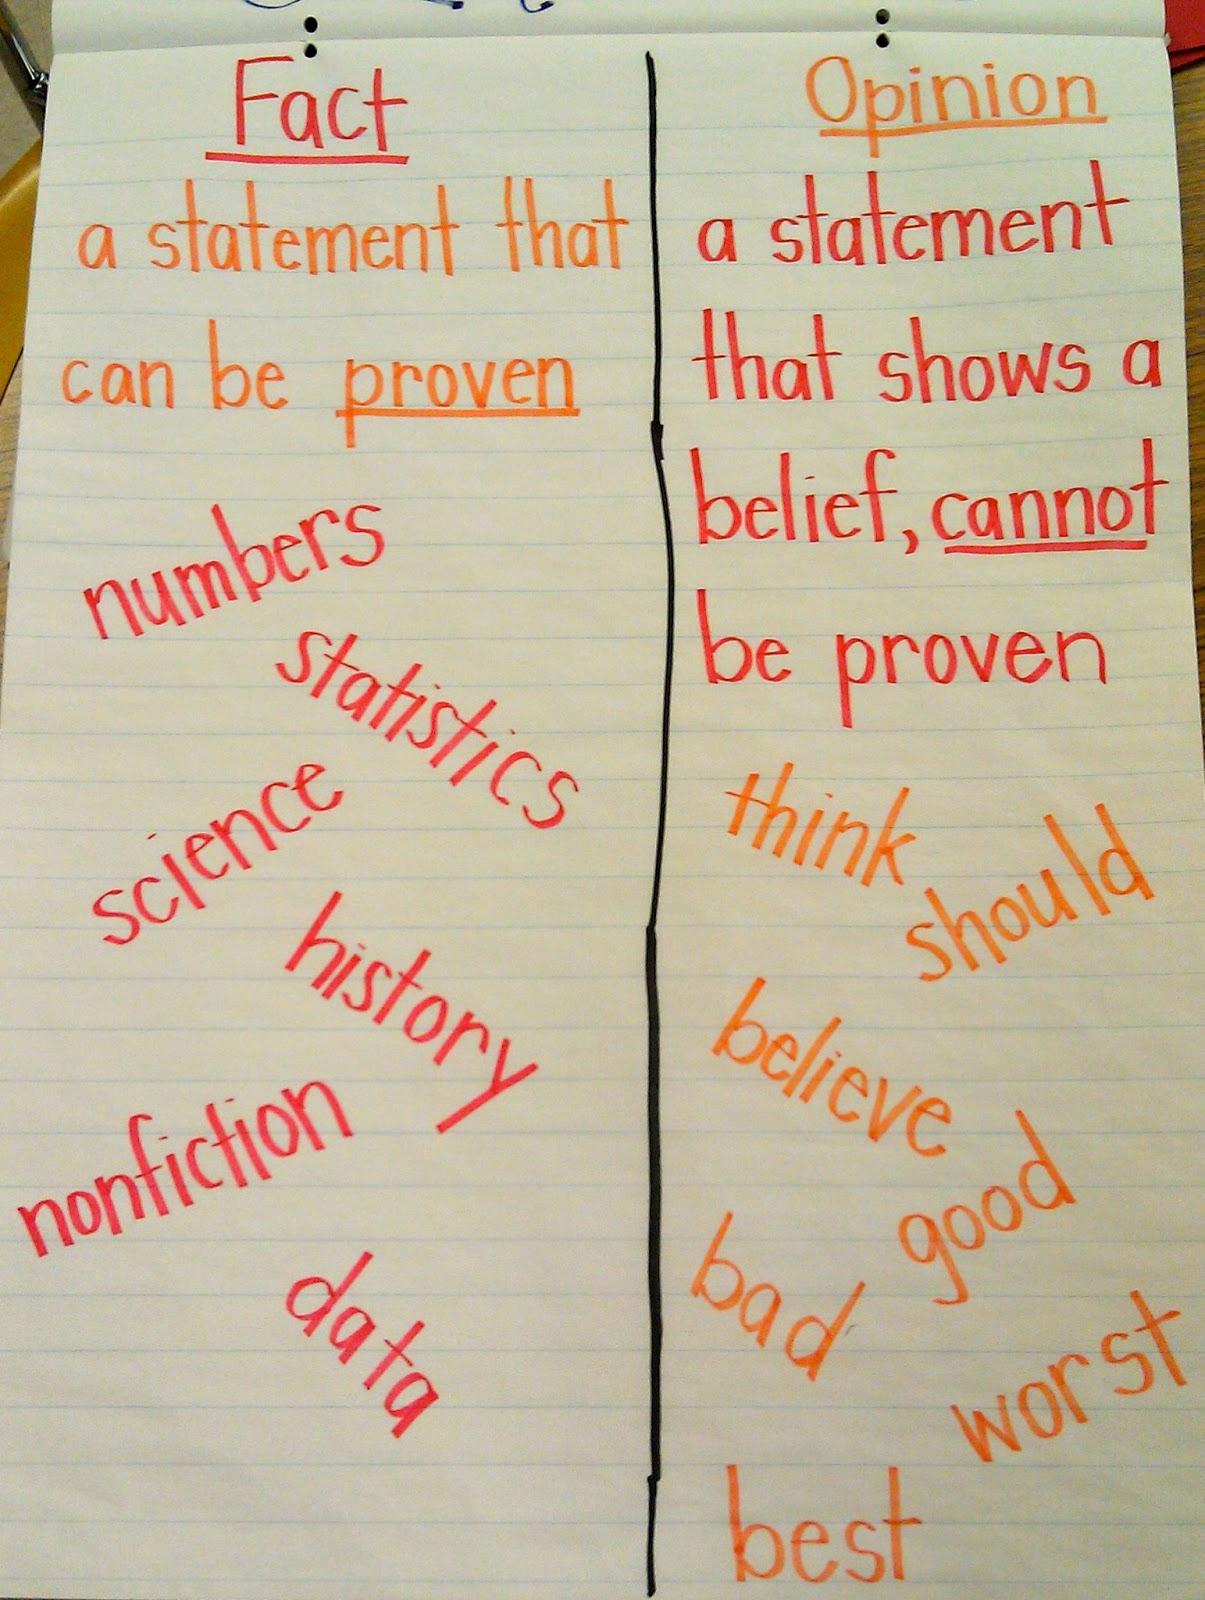 Interesting compare and contrast essay topics